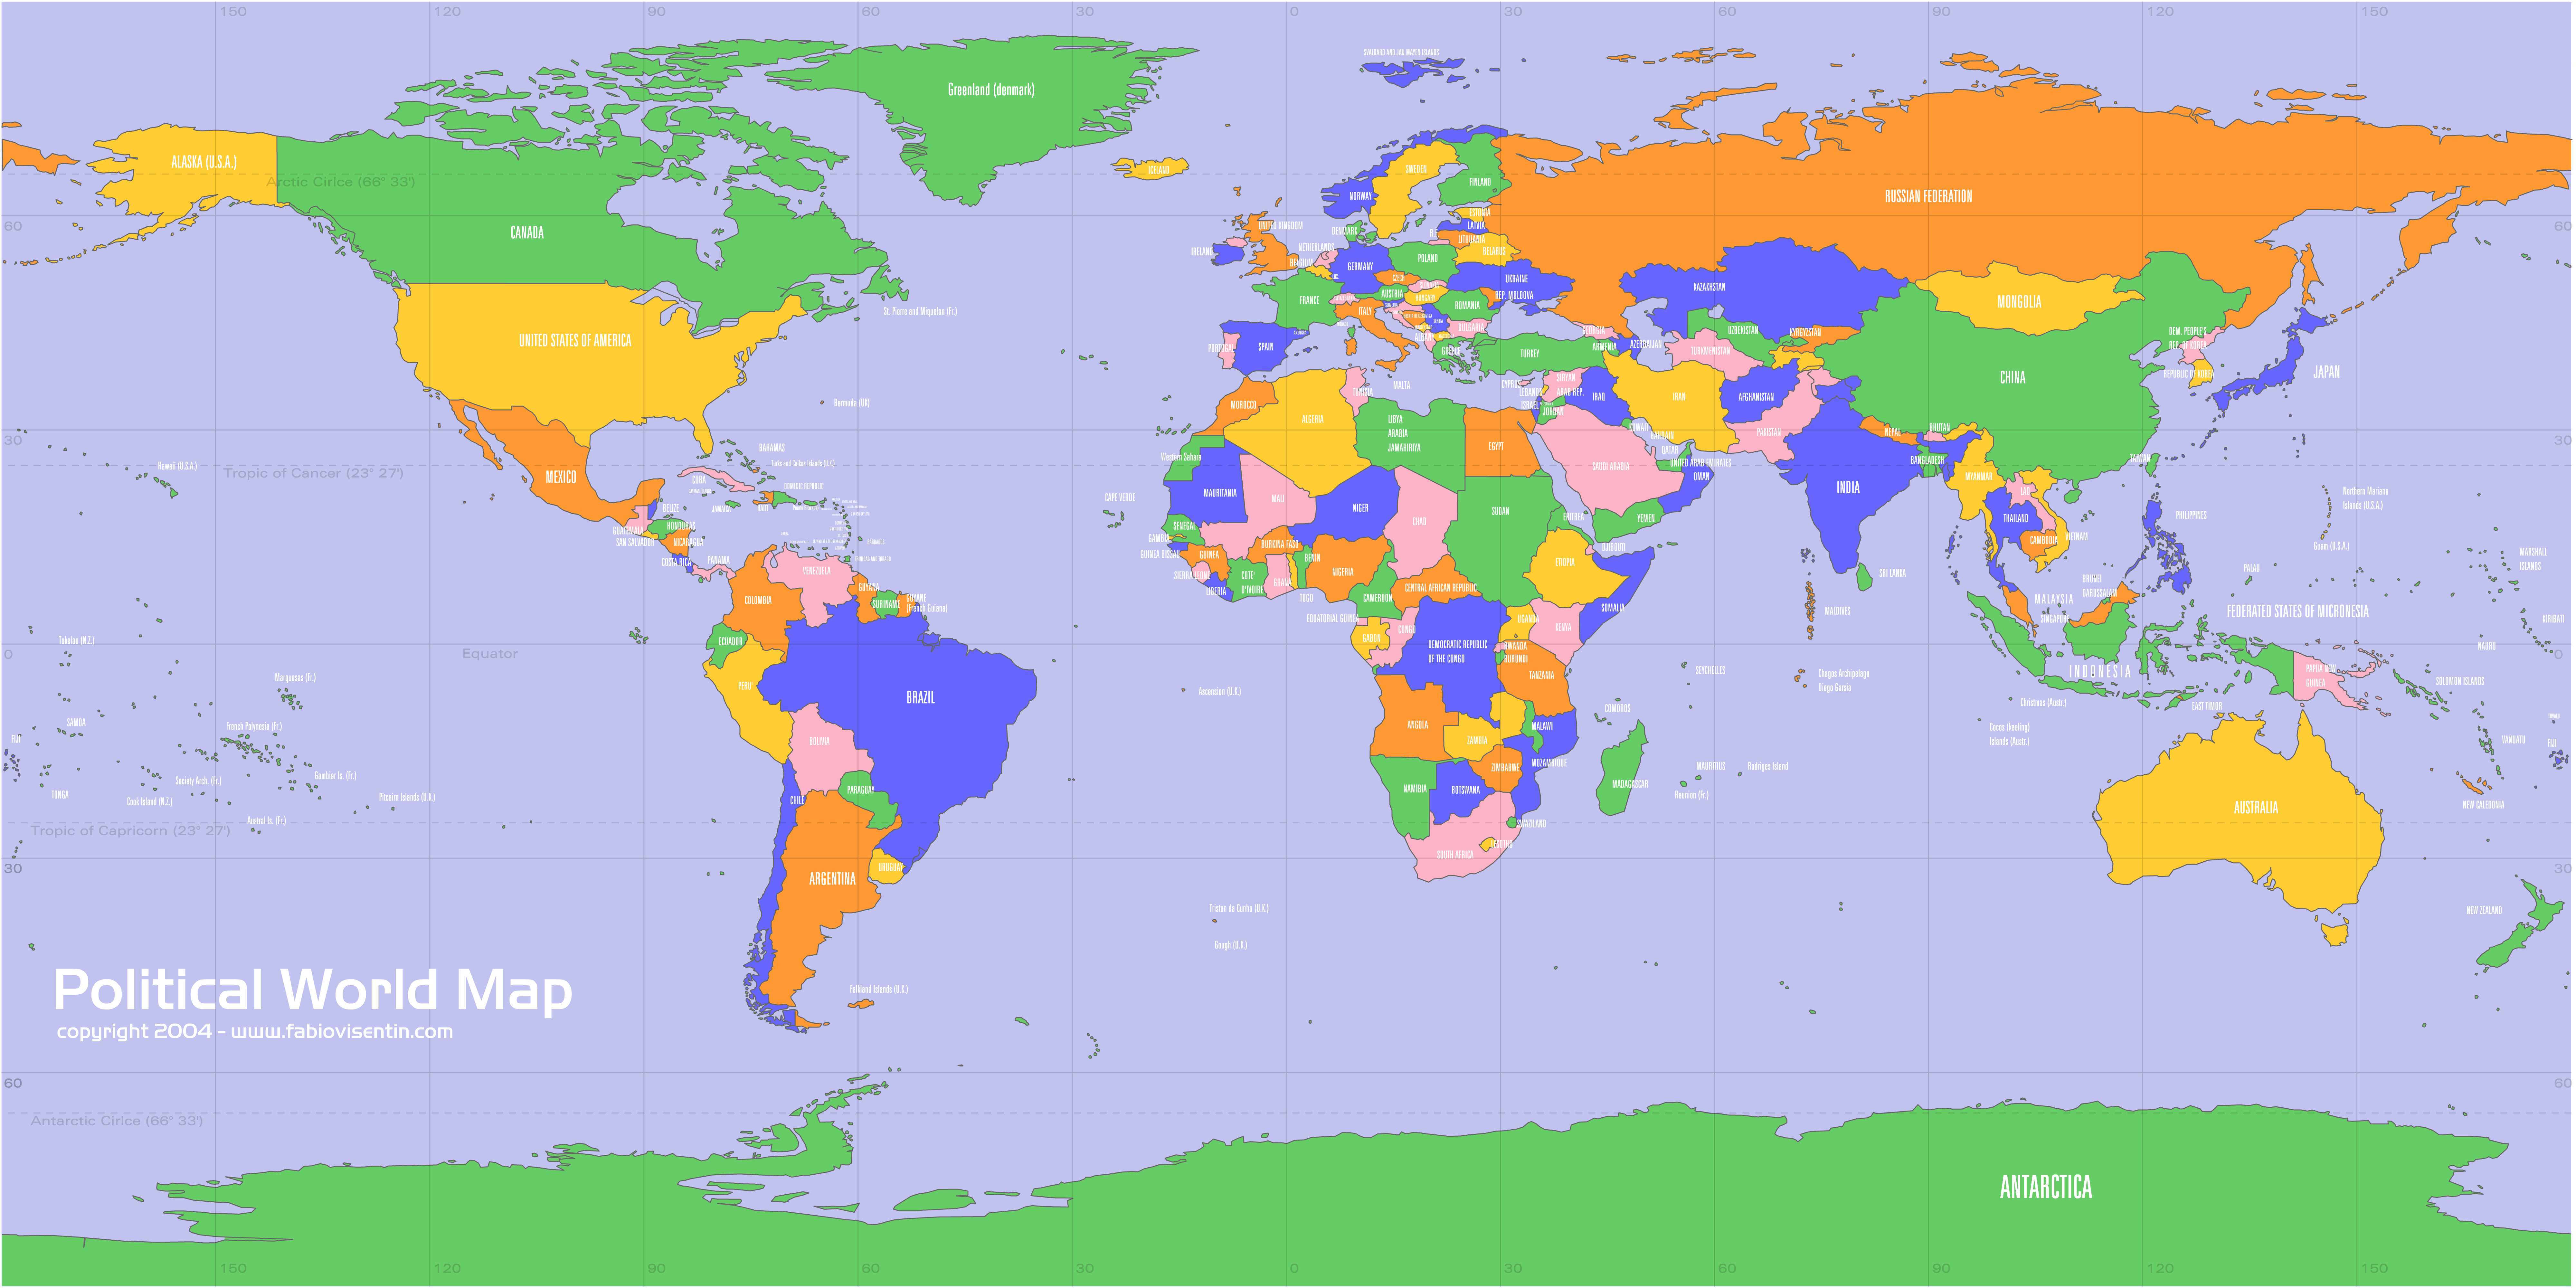 large-size-world-political-map